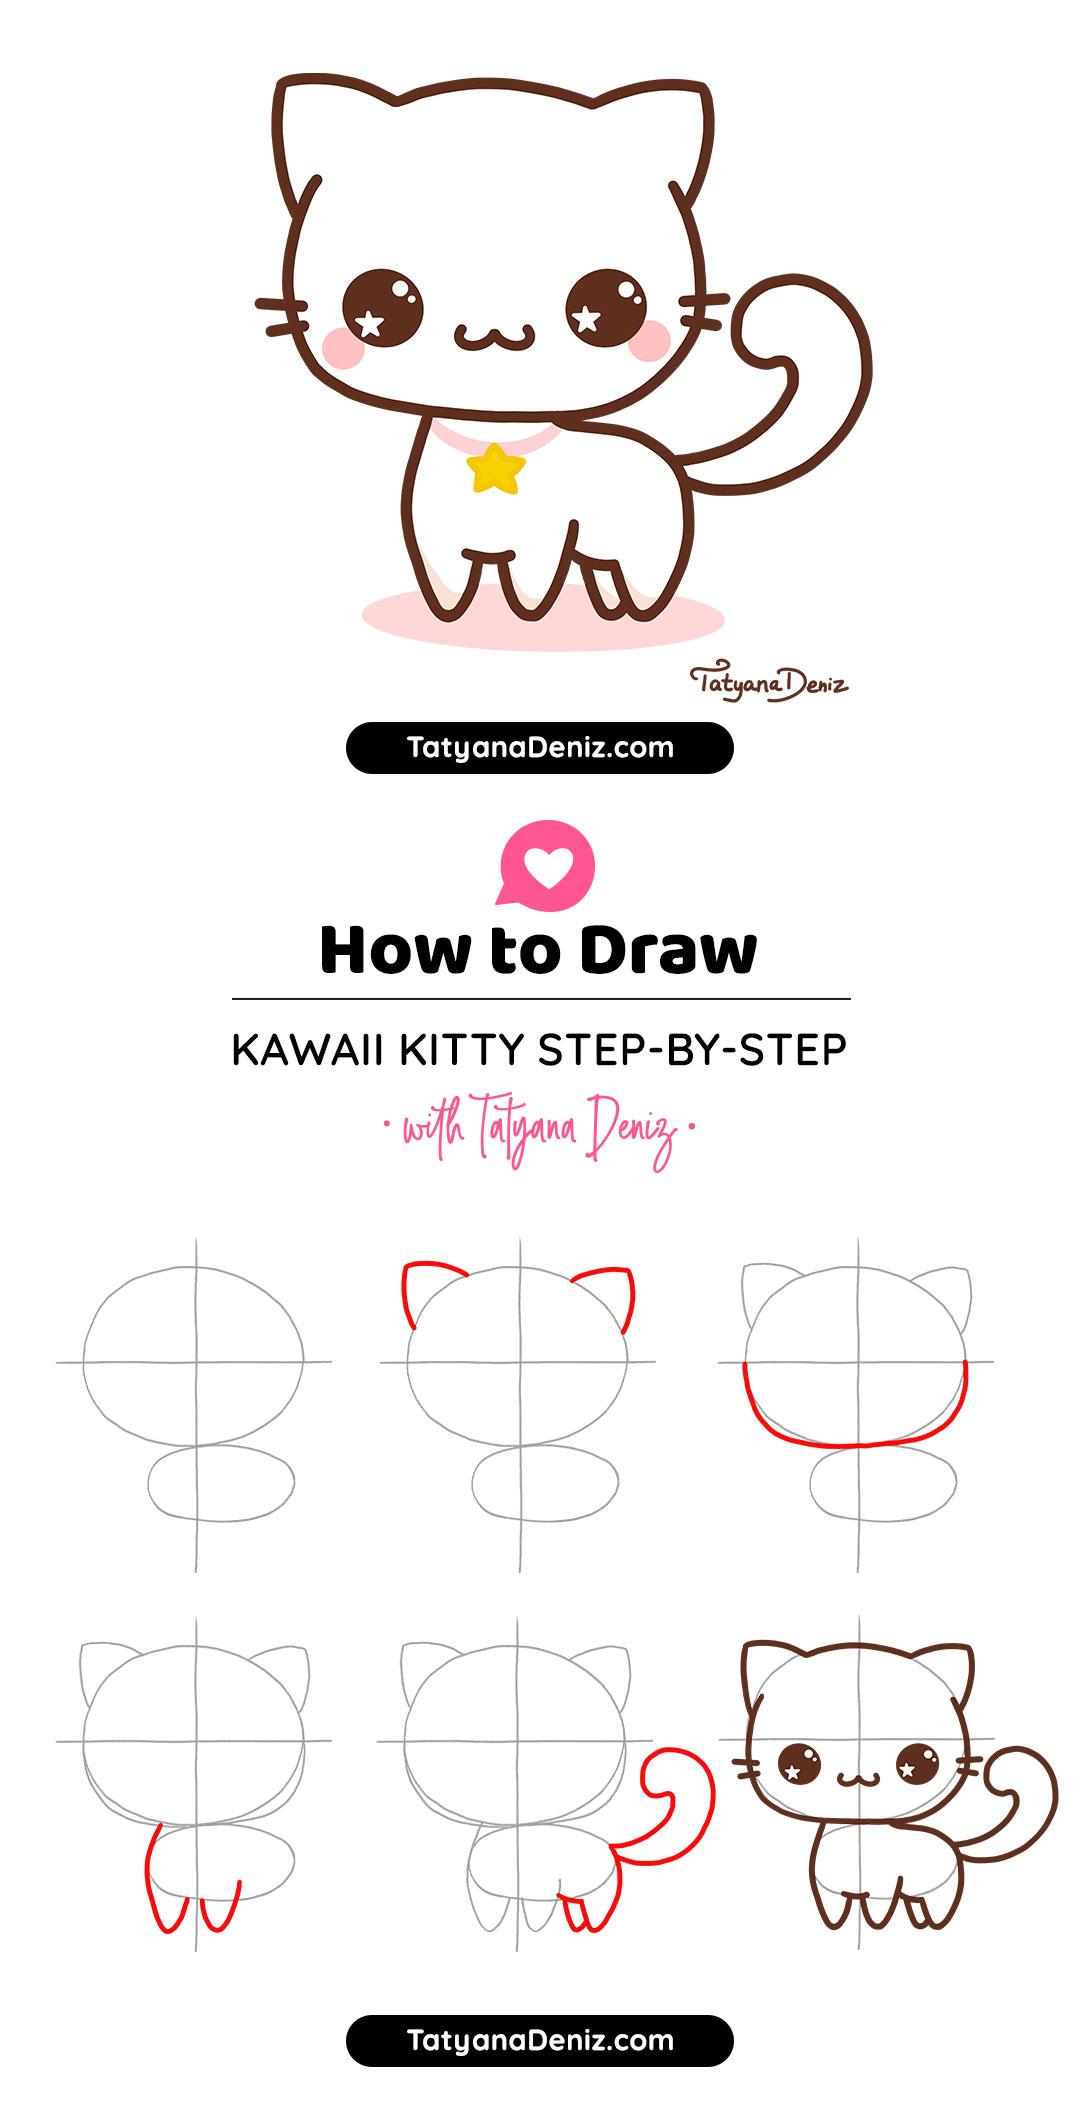 How to draw kawaii cat drawing tutorial